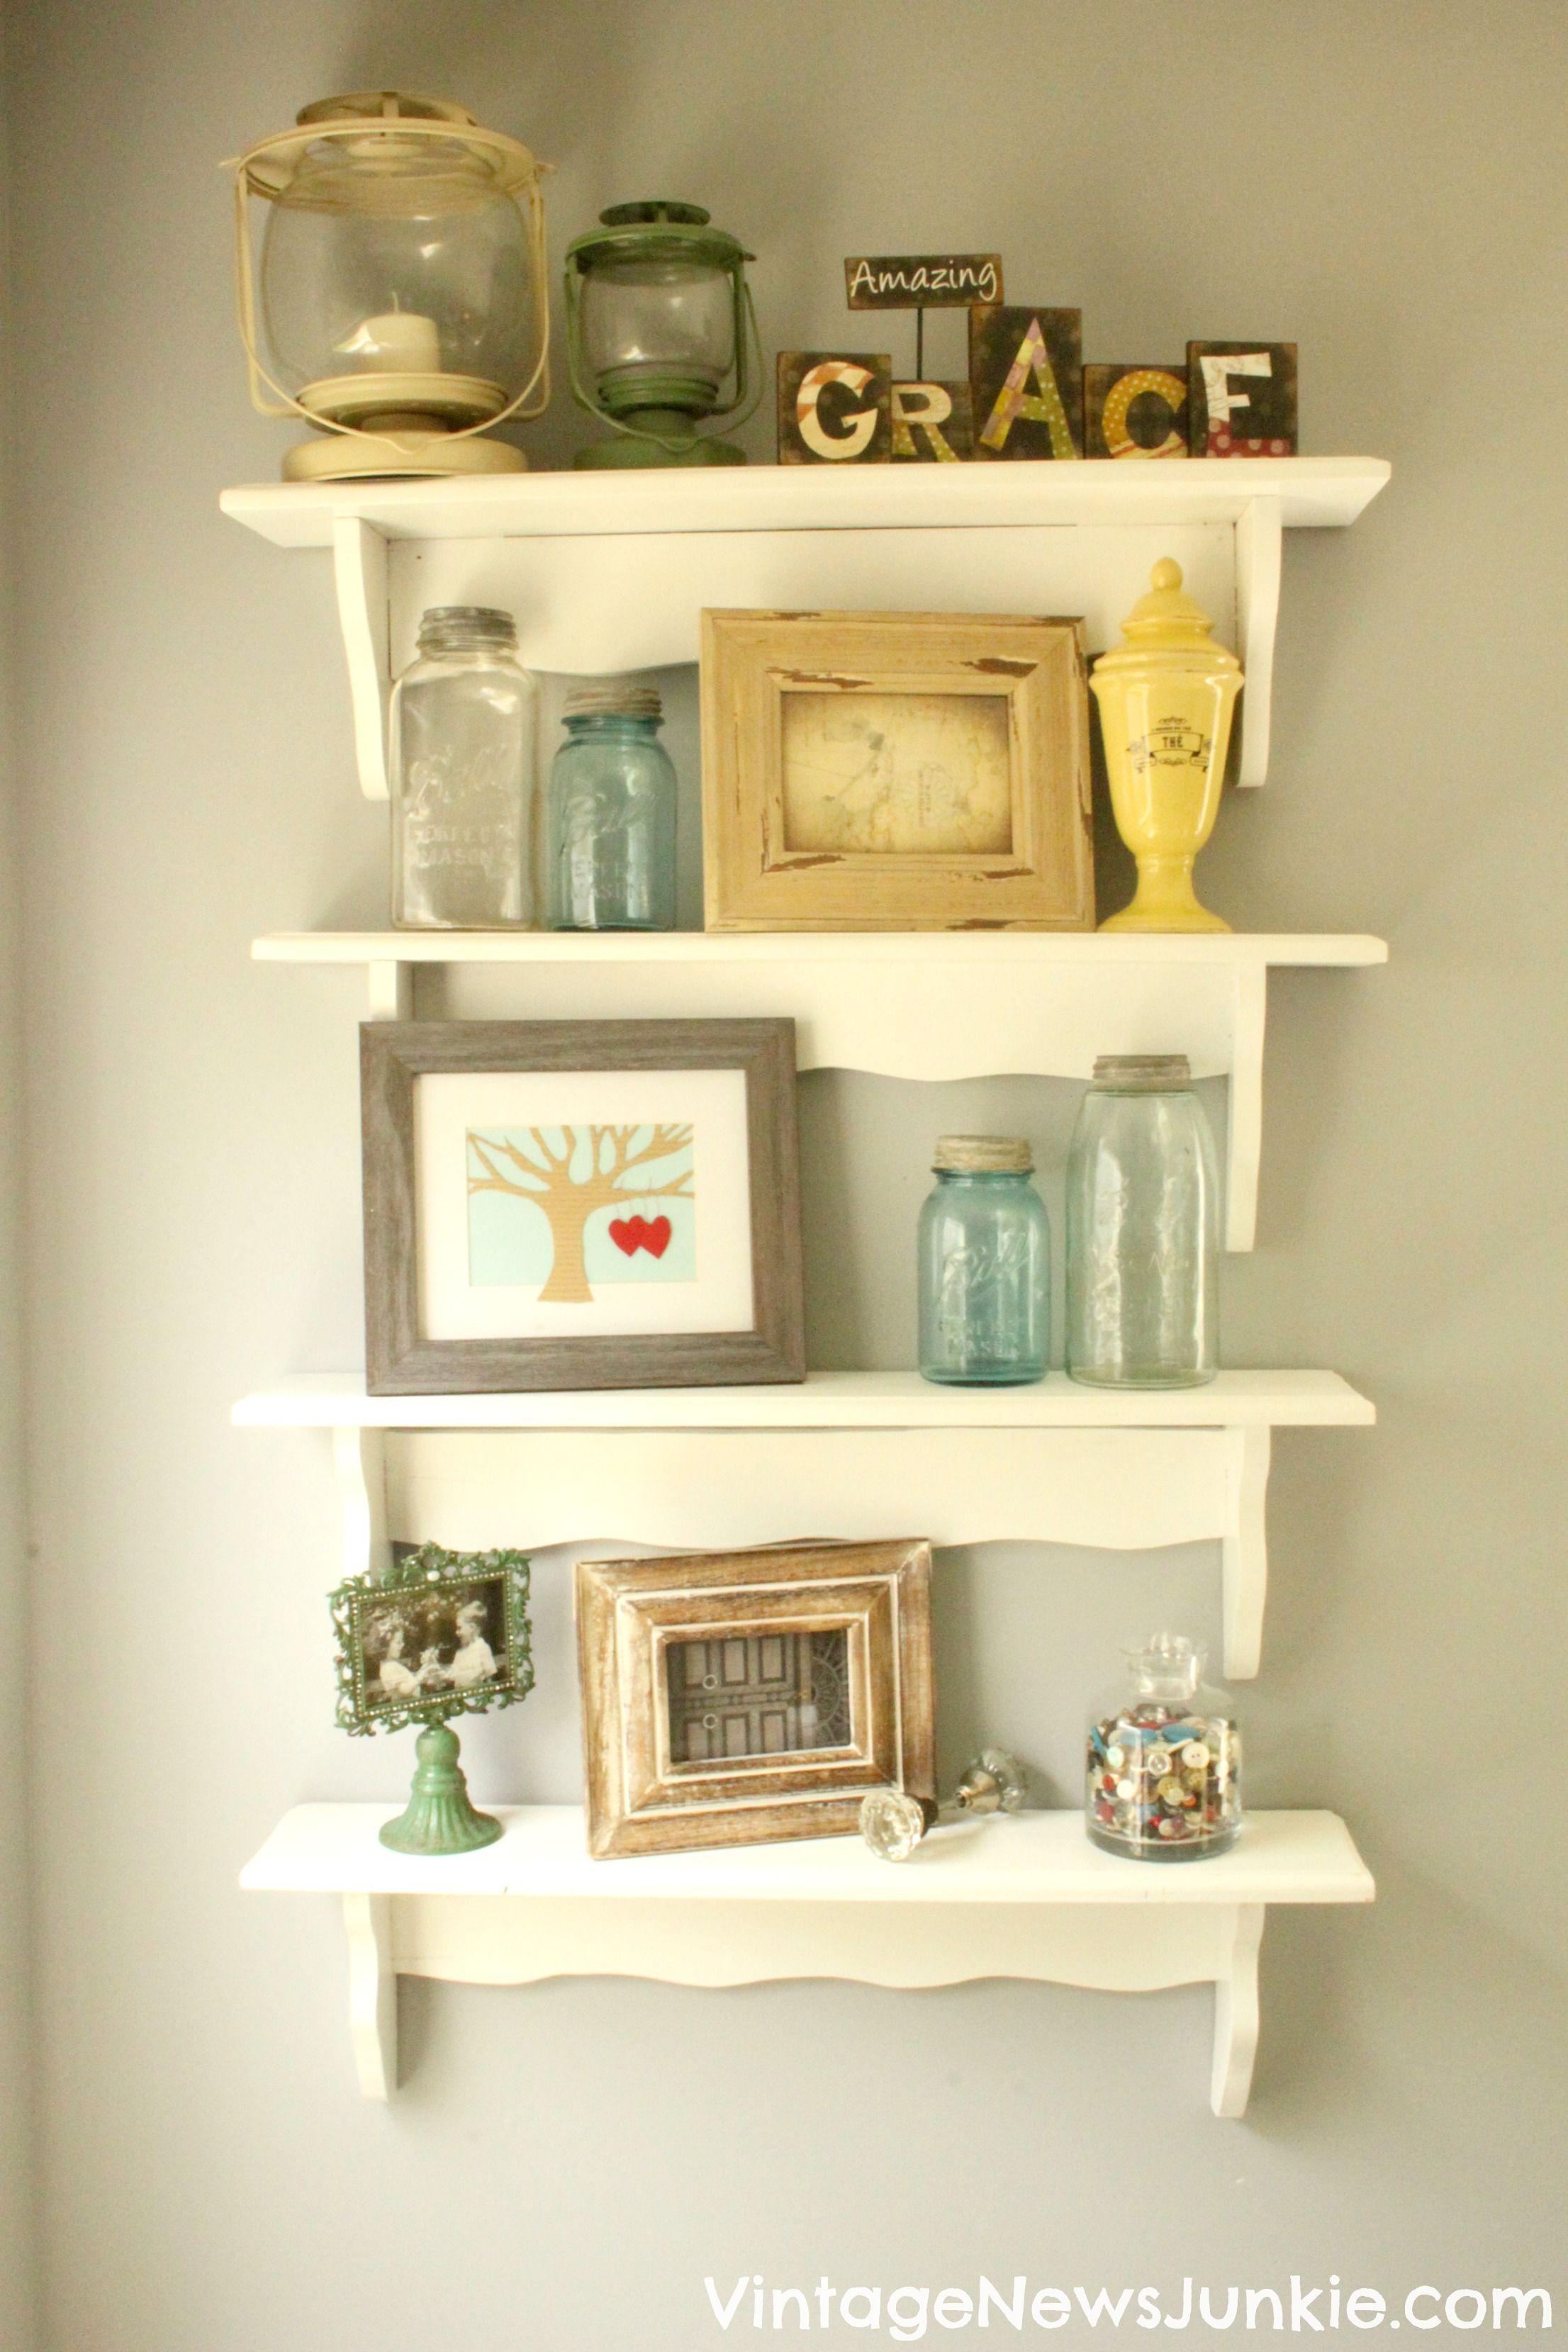 Stack Wooden Shelves for a DRAMATIC Look! | Wooden shelves, Shelves ...